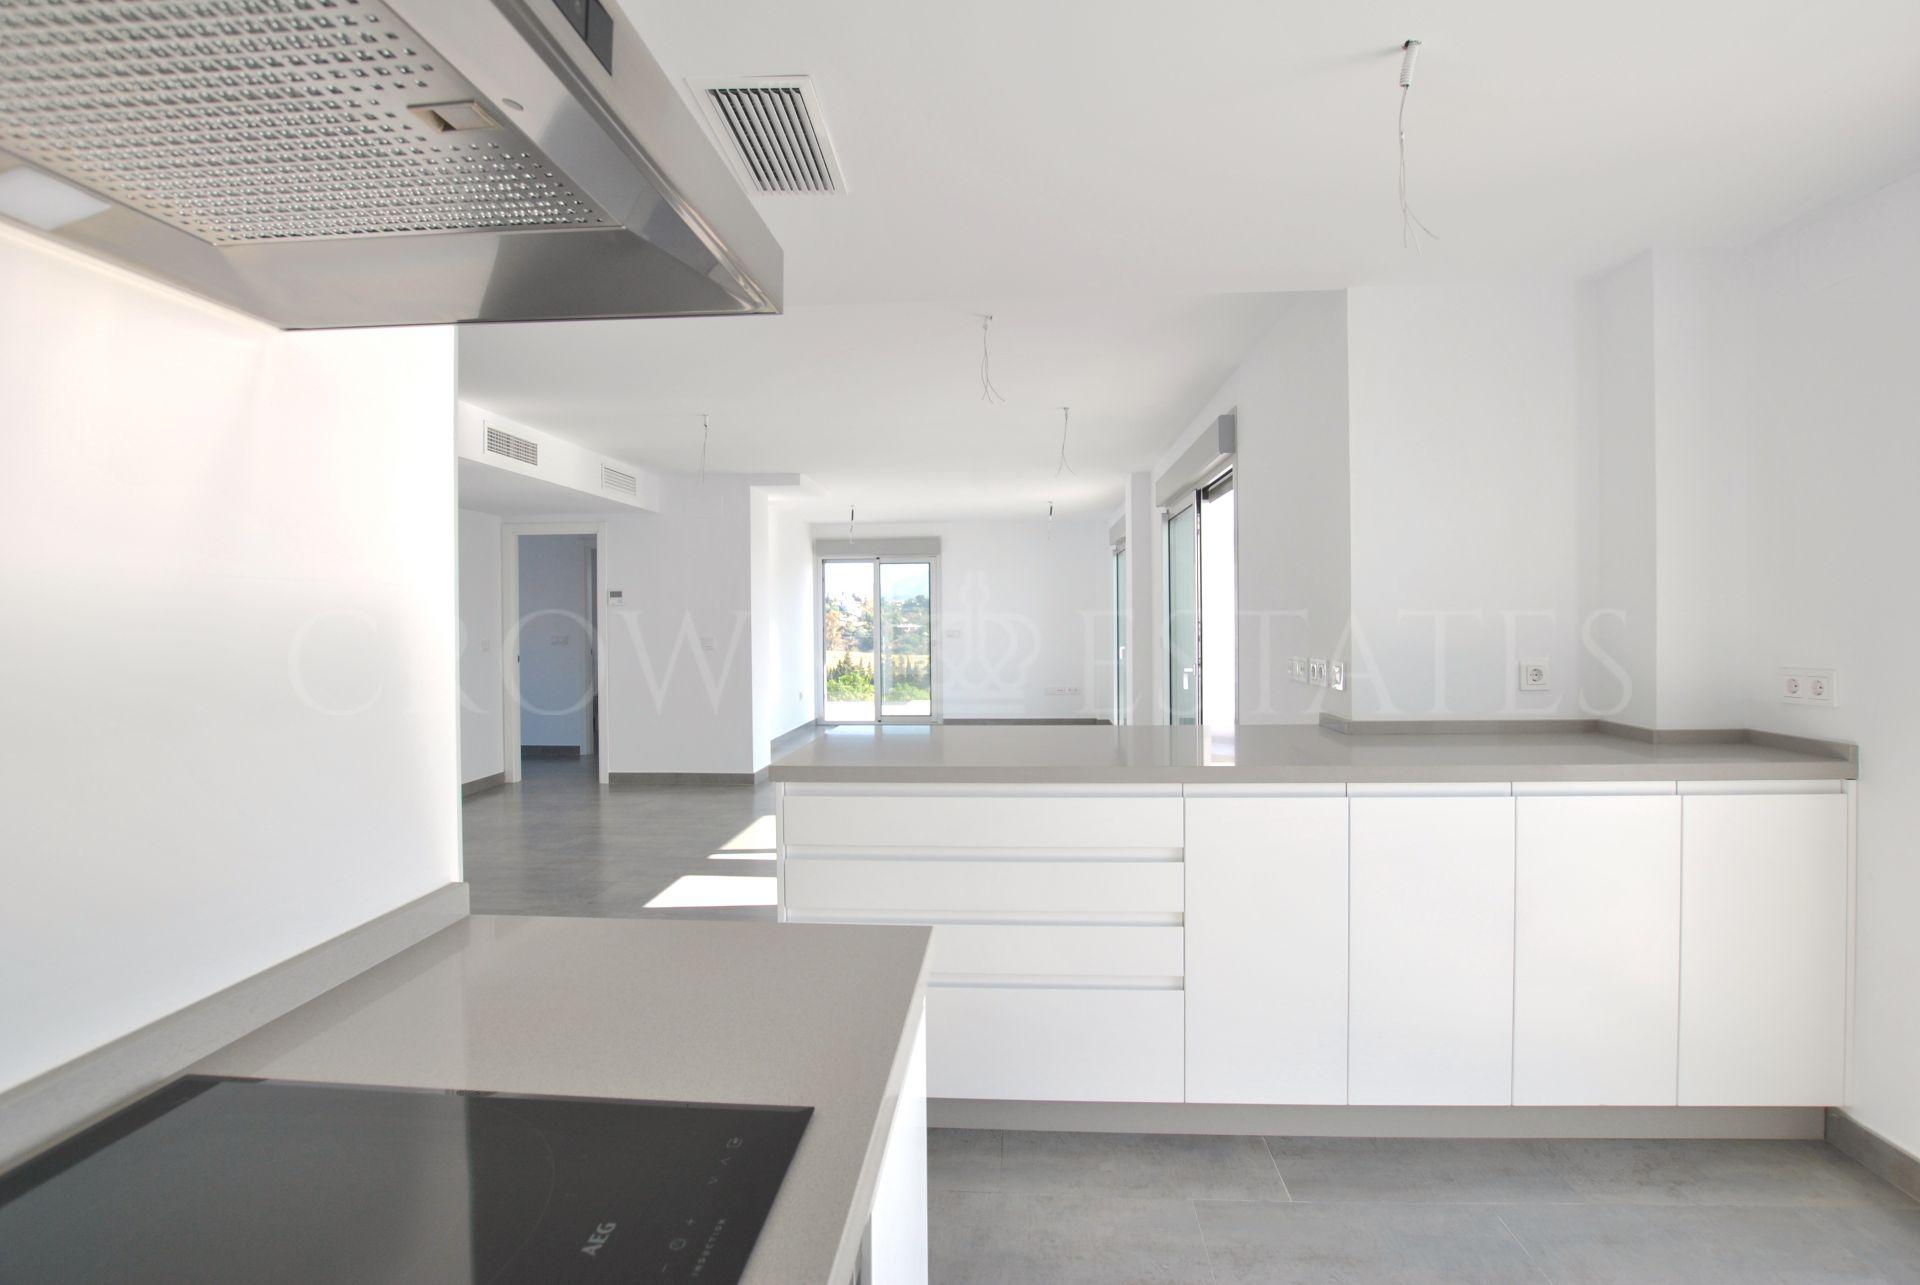 Duplex Penthouse for sale in Atalaya, Estepona